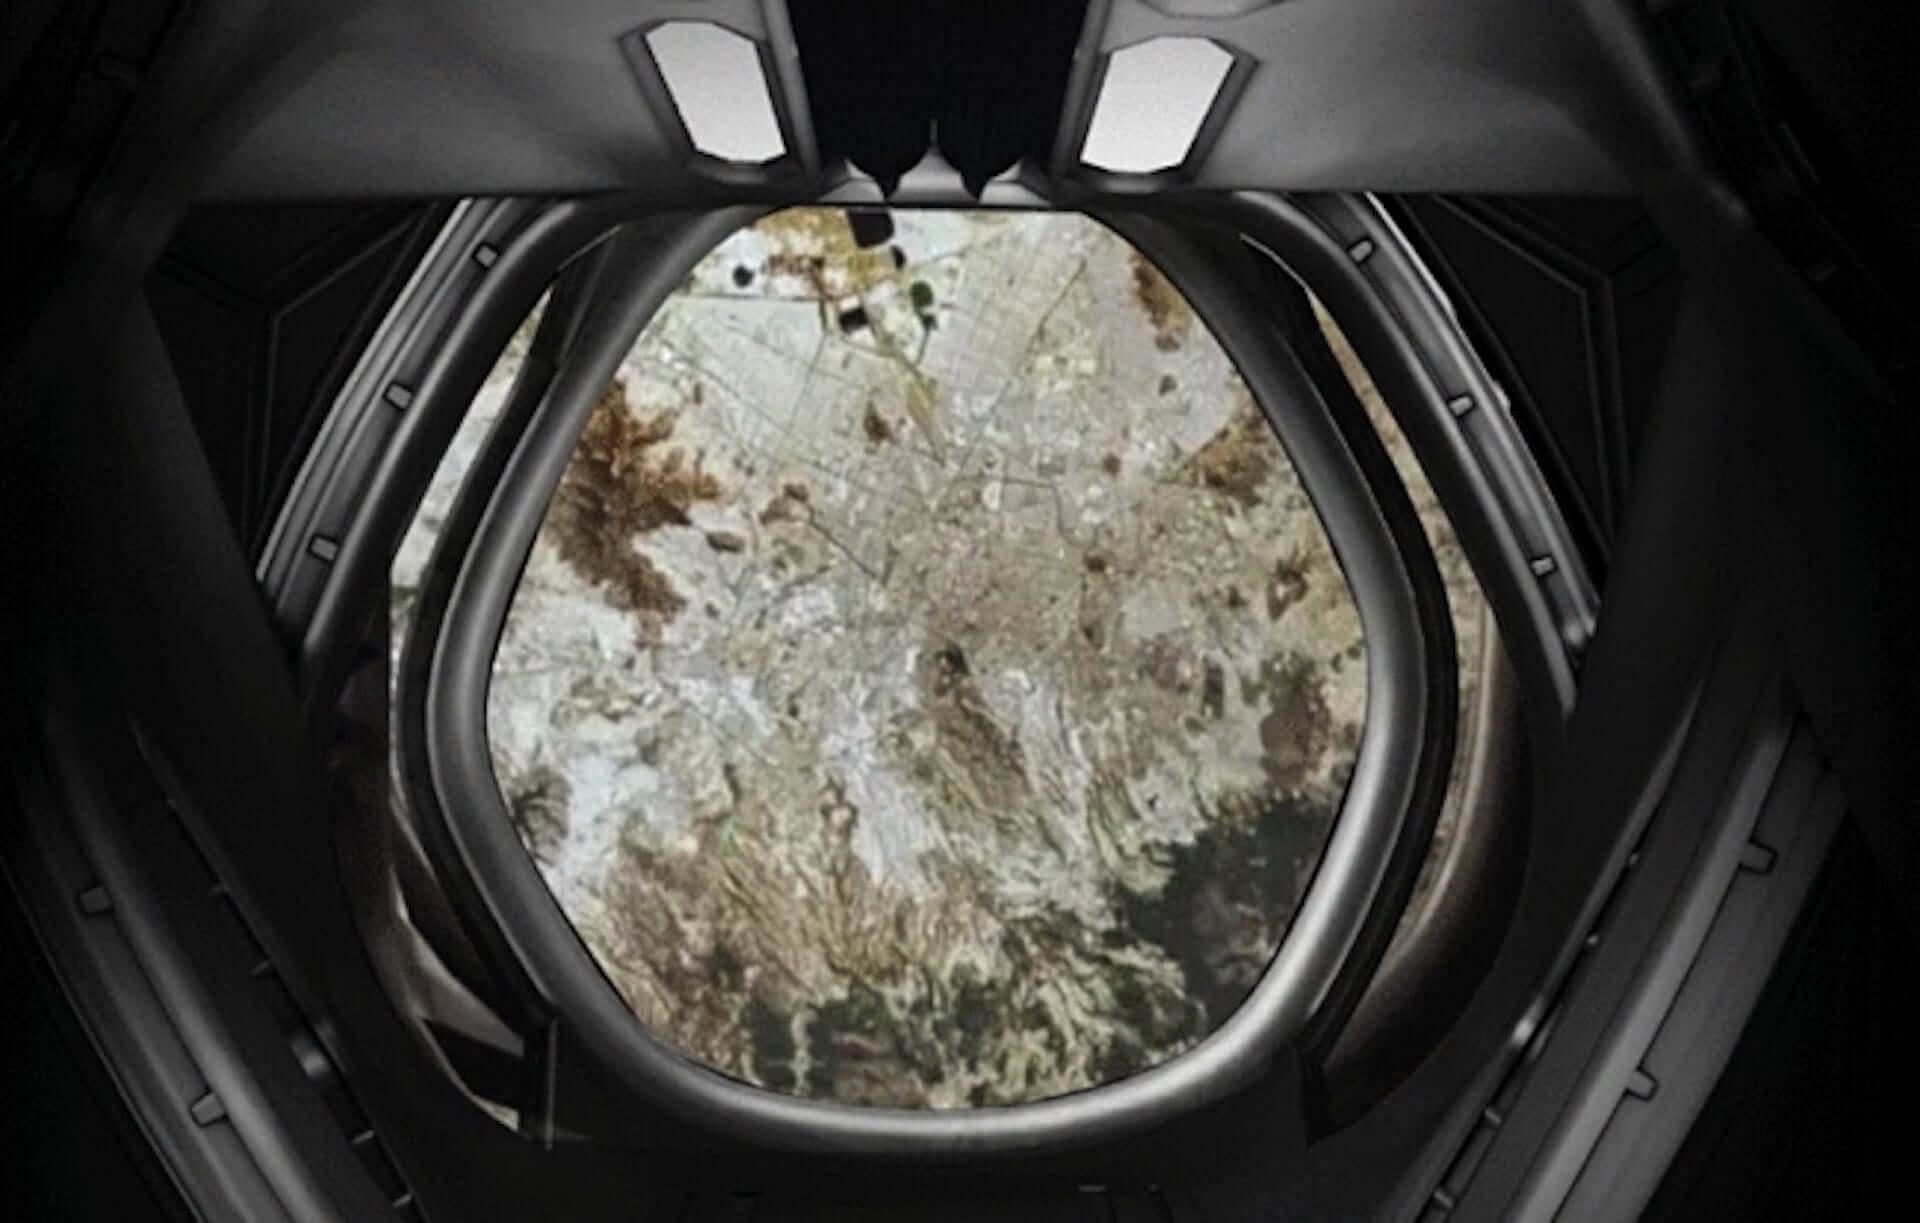 NASA公認&設立60周年記念のARマグカップ!宇宙船からの眺めを体験できる『Space Mug』がGLOTURE.JPに再入荷 tech200729_gloture_4-1920x1223